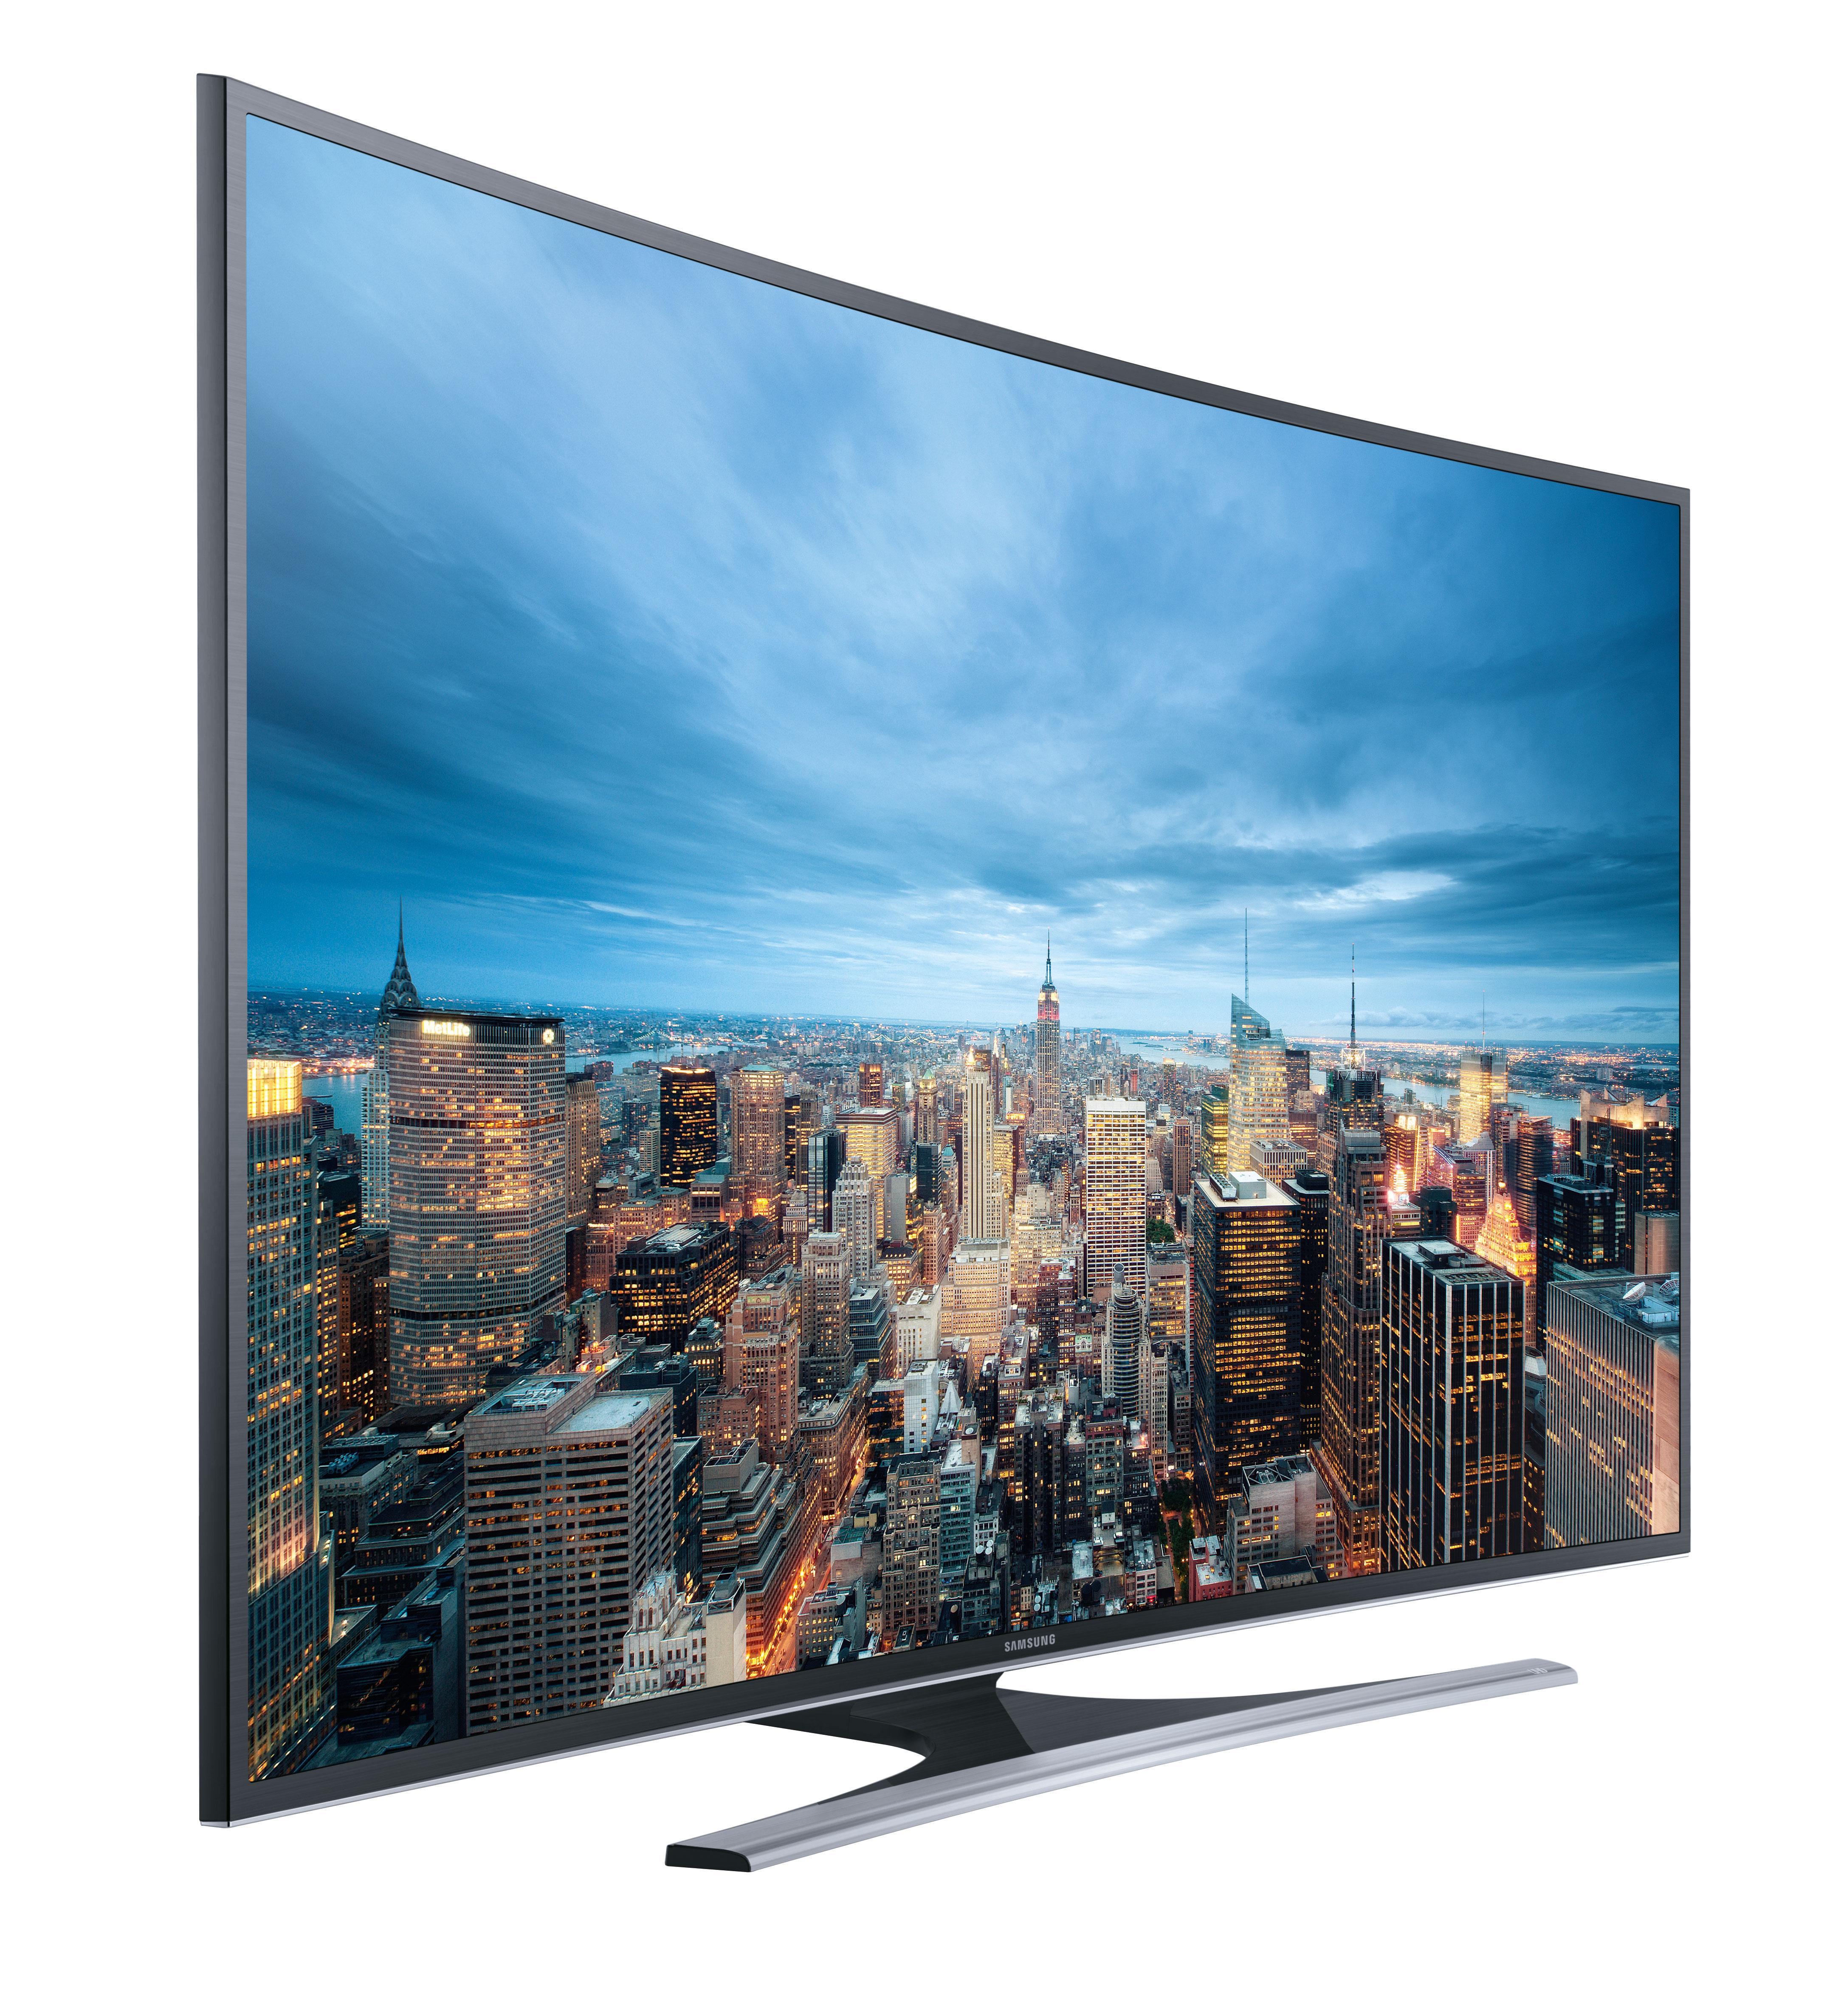 samsung ju6560 163 cm 65 zoll curved fernseher ultra hd triple tuner smart tv. Black Bedroom Furniture Sets. Home Design Ideas